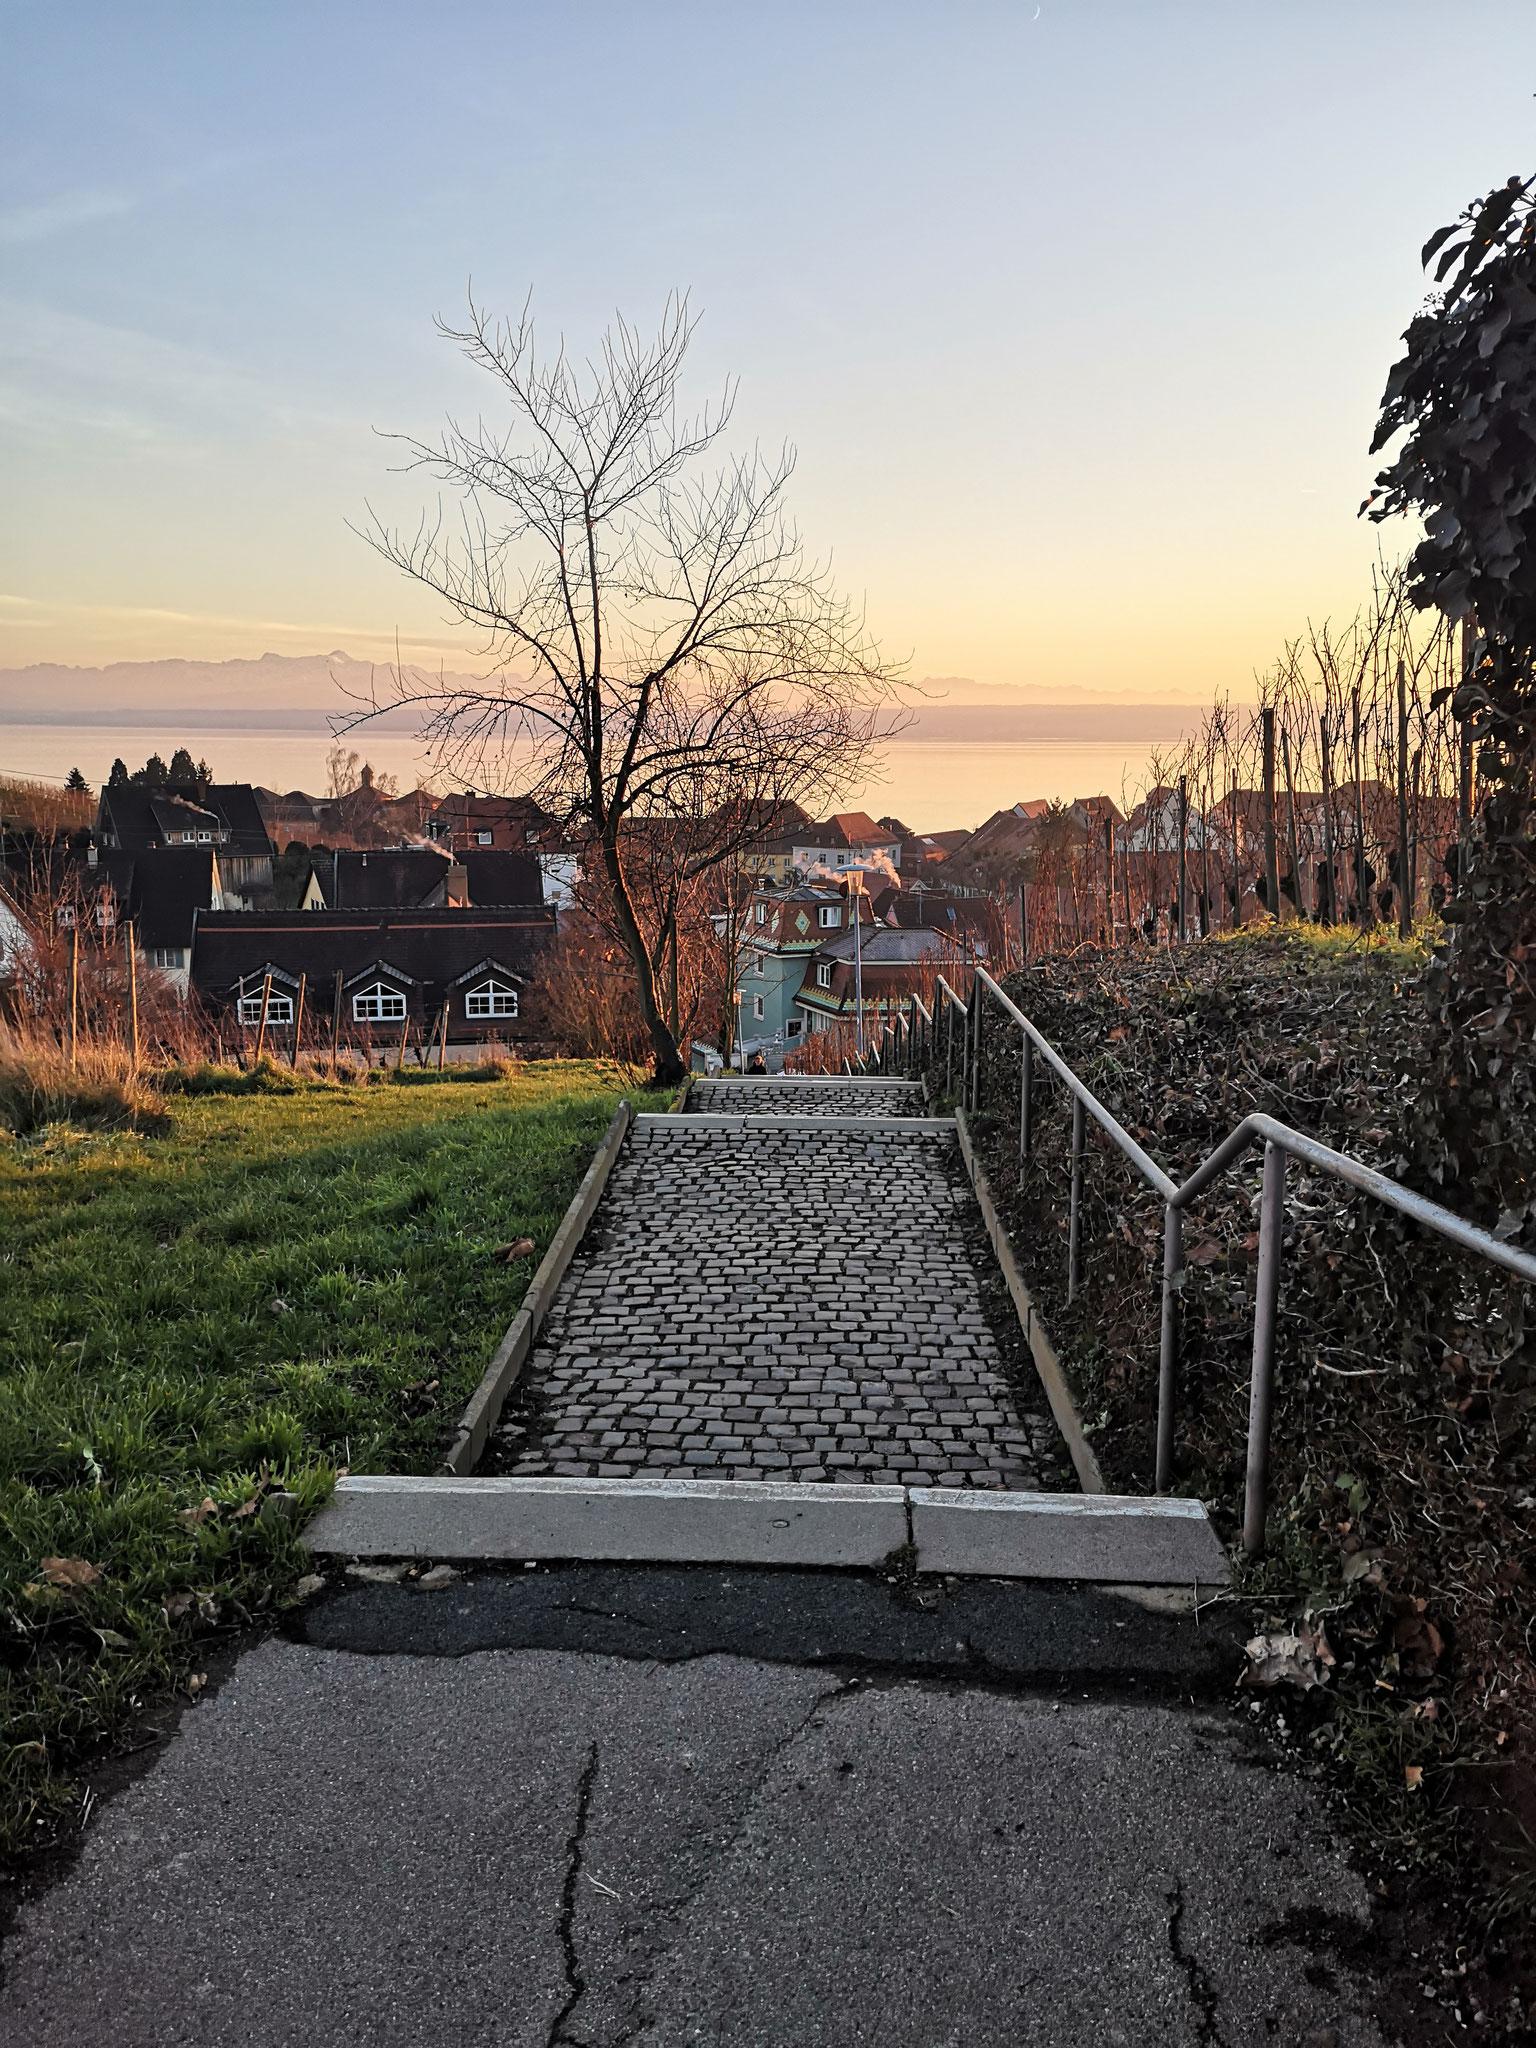 Treppe zur Altstadt - direkt vor dem Haus